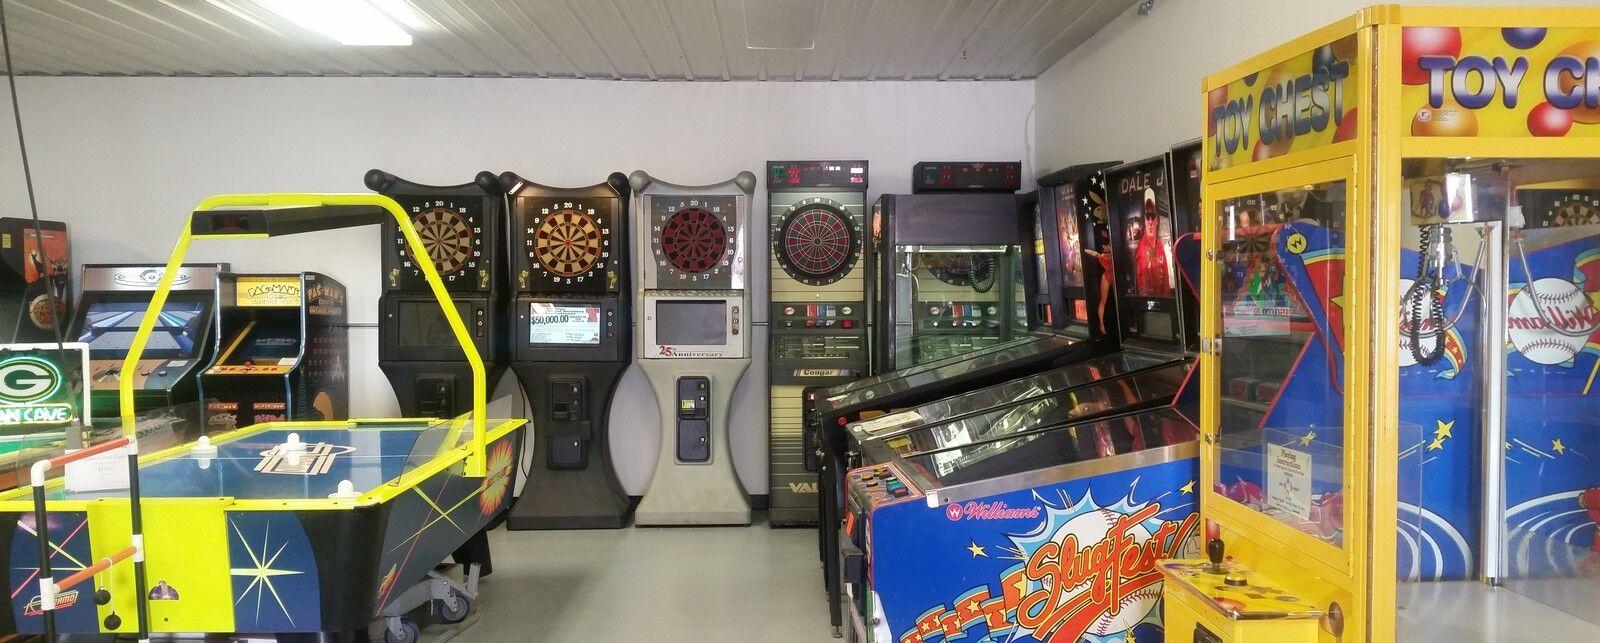 Fun Company Game Room Store